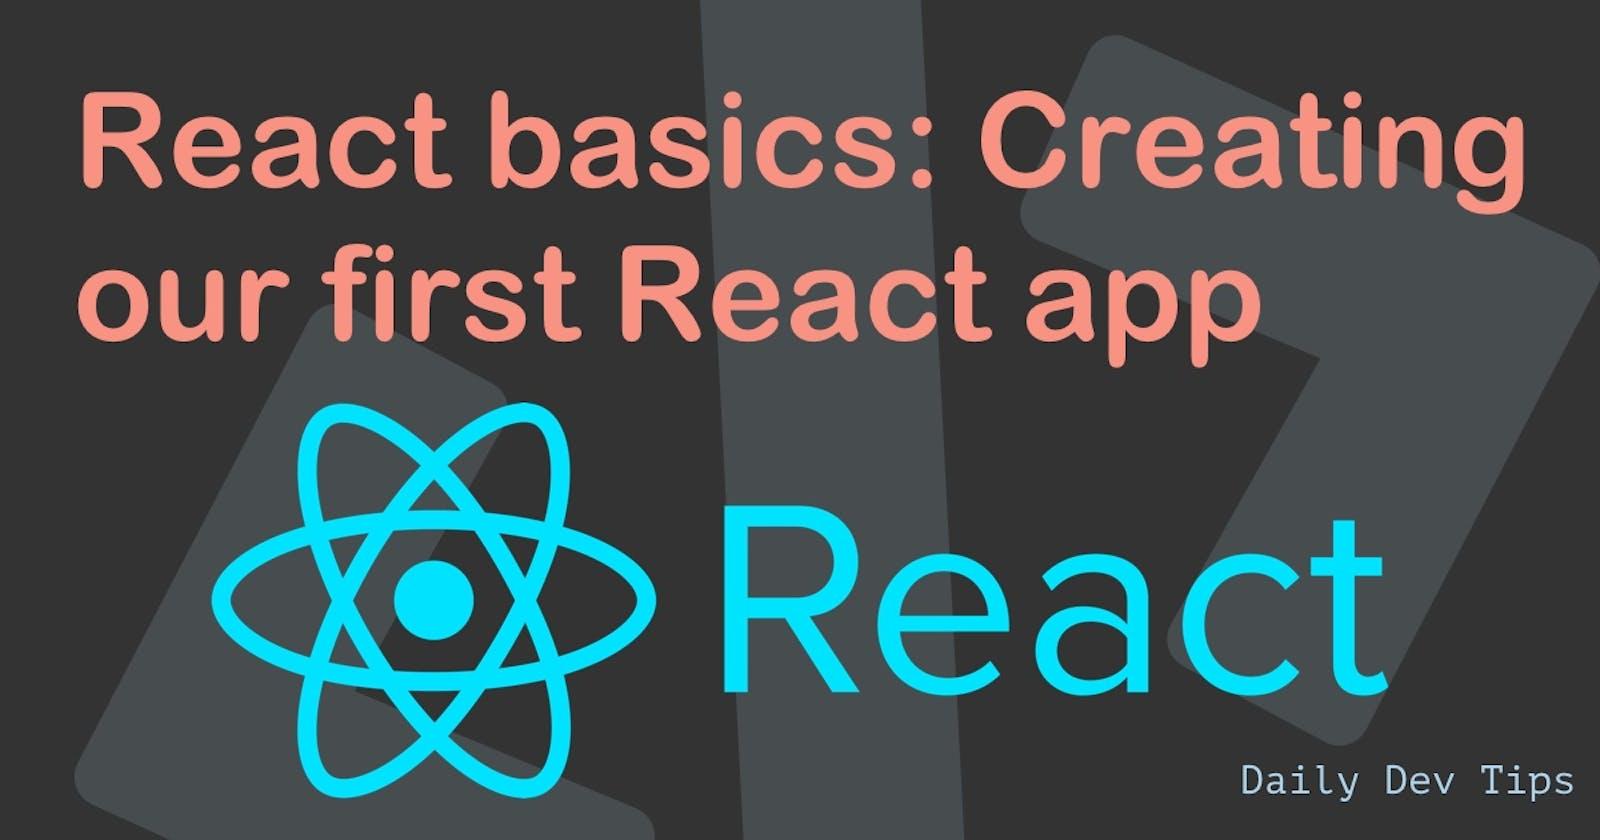 React basics: Creating our first React app